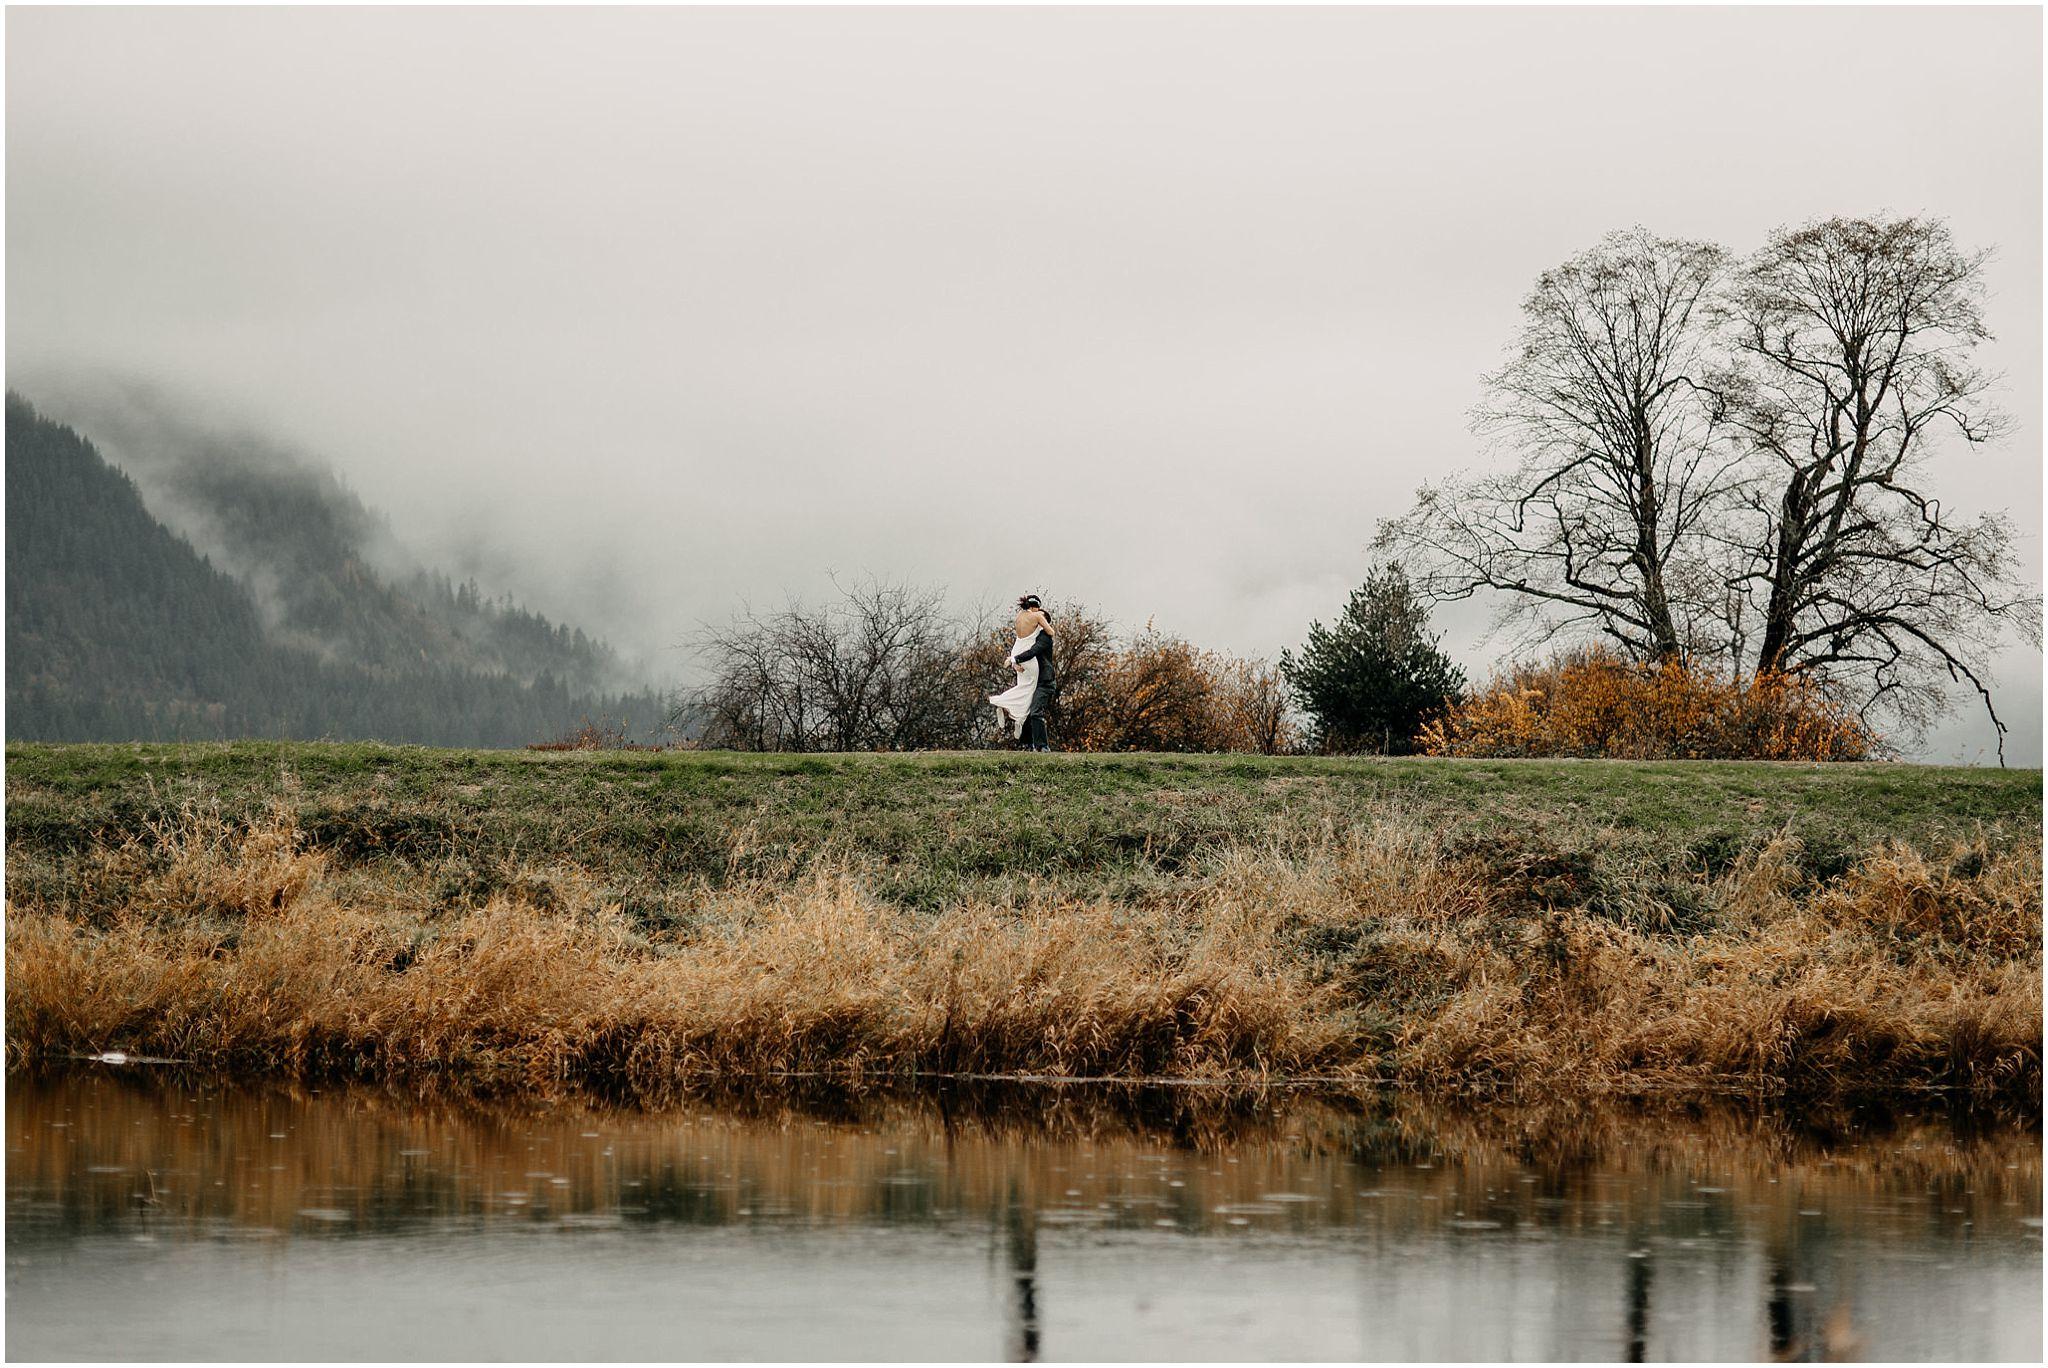 aileen-choi-photo-pitt-lake-engagement-session_0027.jpg